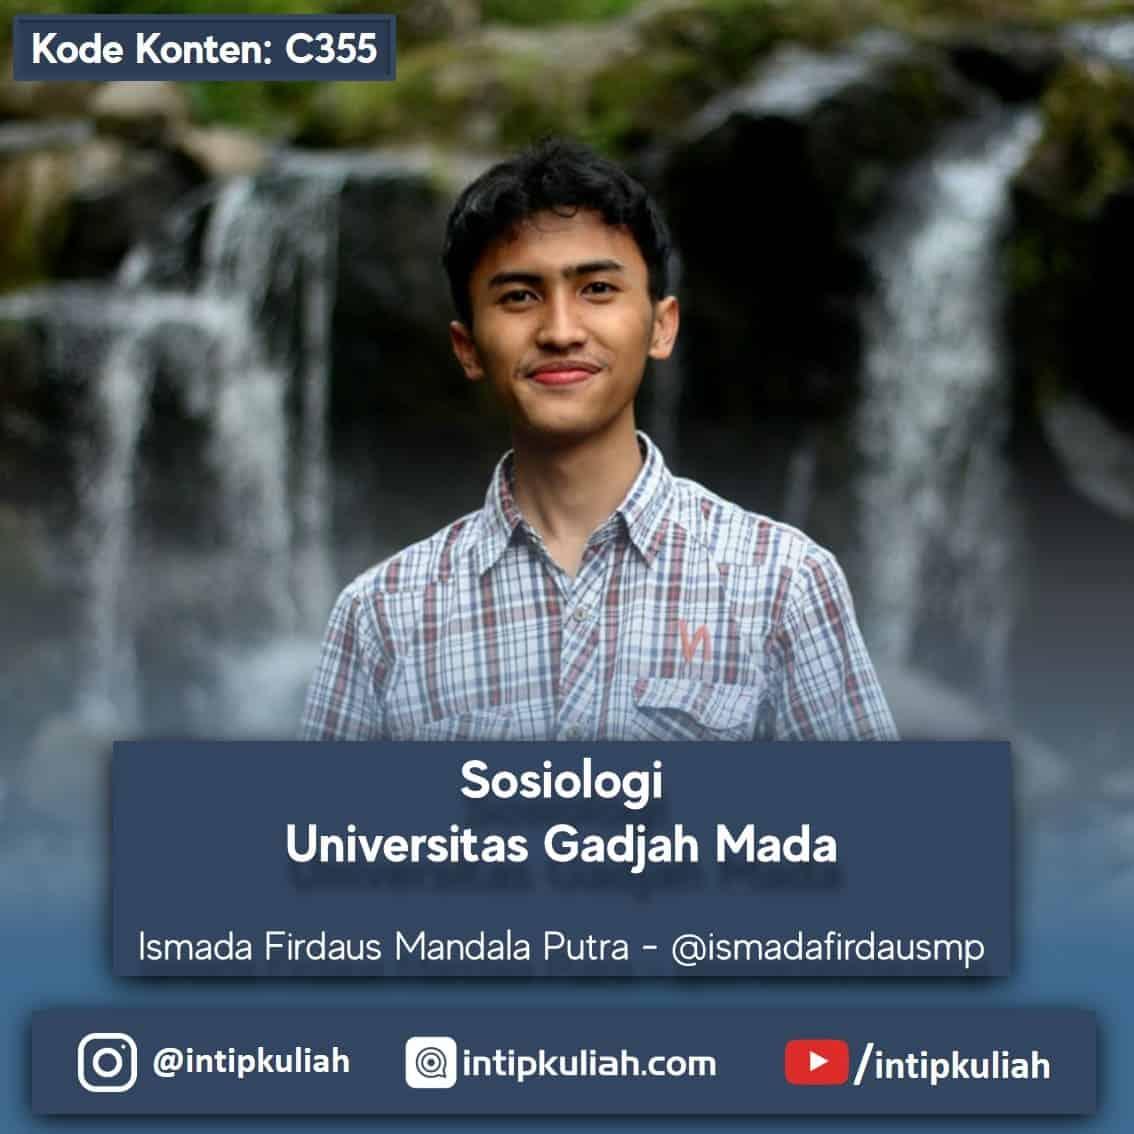 Sosiologi Universitas Gadjah Mada (Ismada)